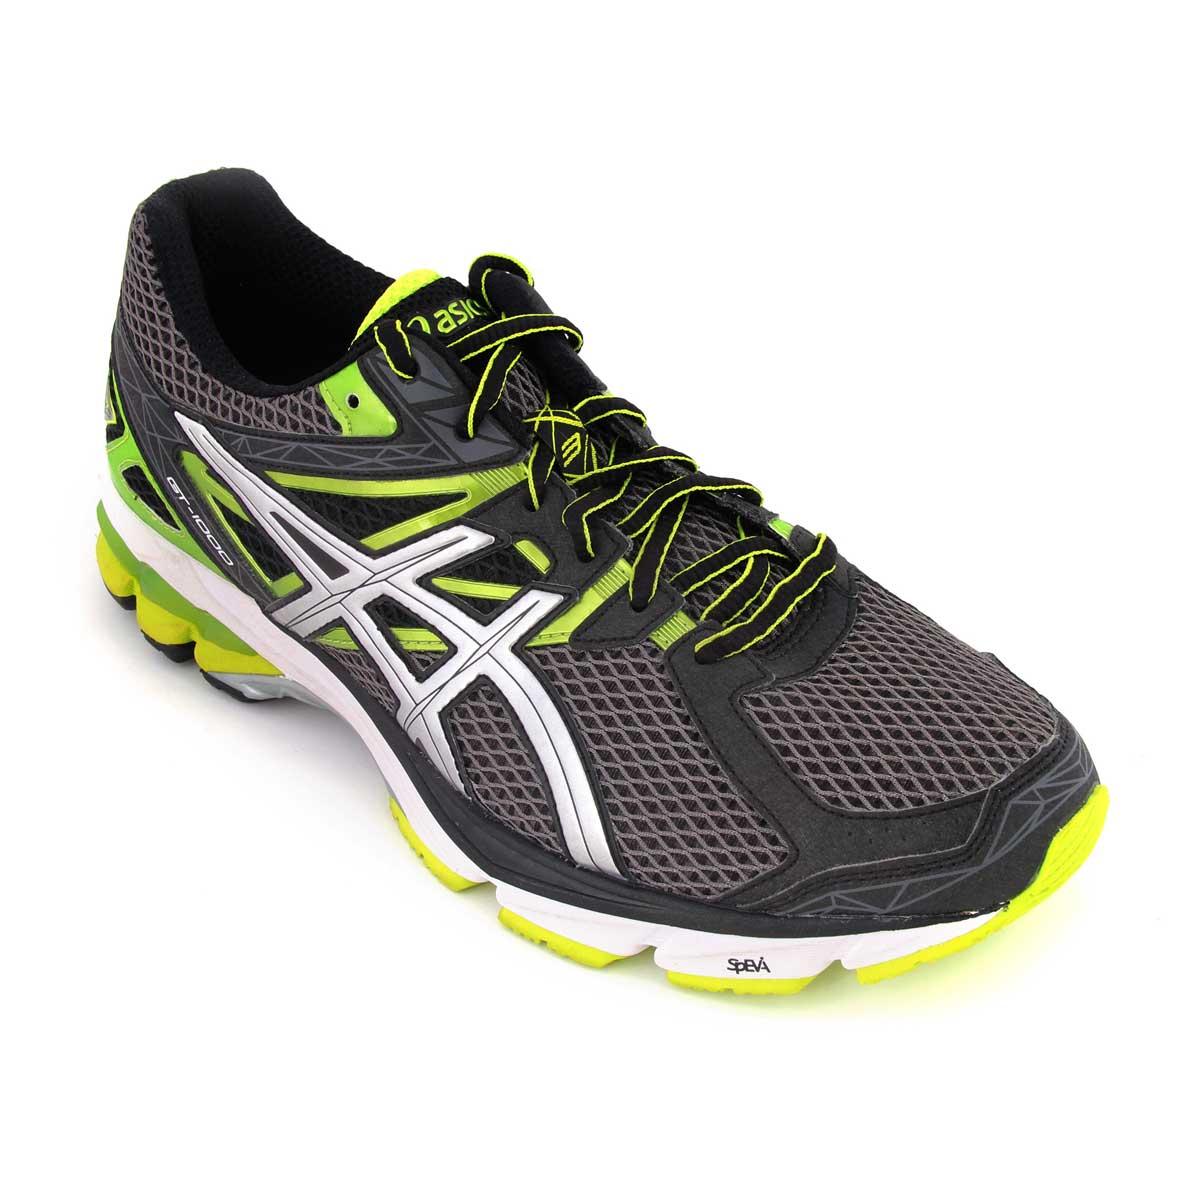 Running Shoes, Running, Buy, Asics, Asics GT-1000 3 Running Shoes  (Carbon/Lighting/Green)